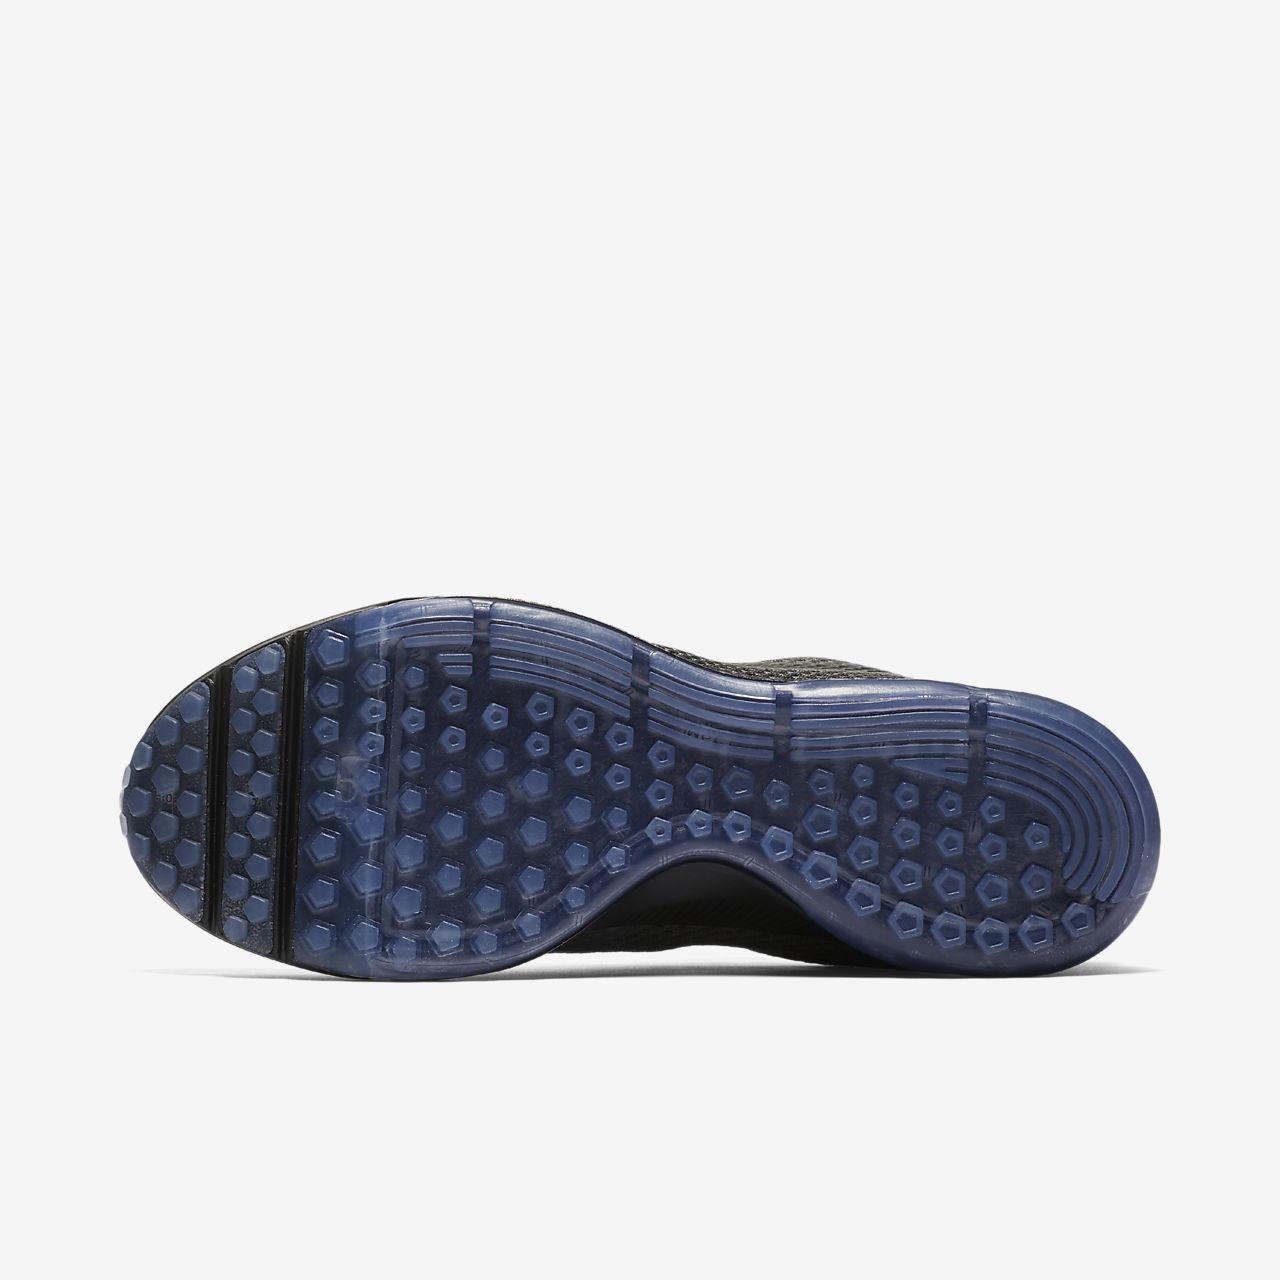 20dbaa5be75b8 Nike Zoom All Out Low 2 Women s Running Shoe. Nike.com AU